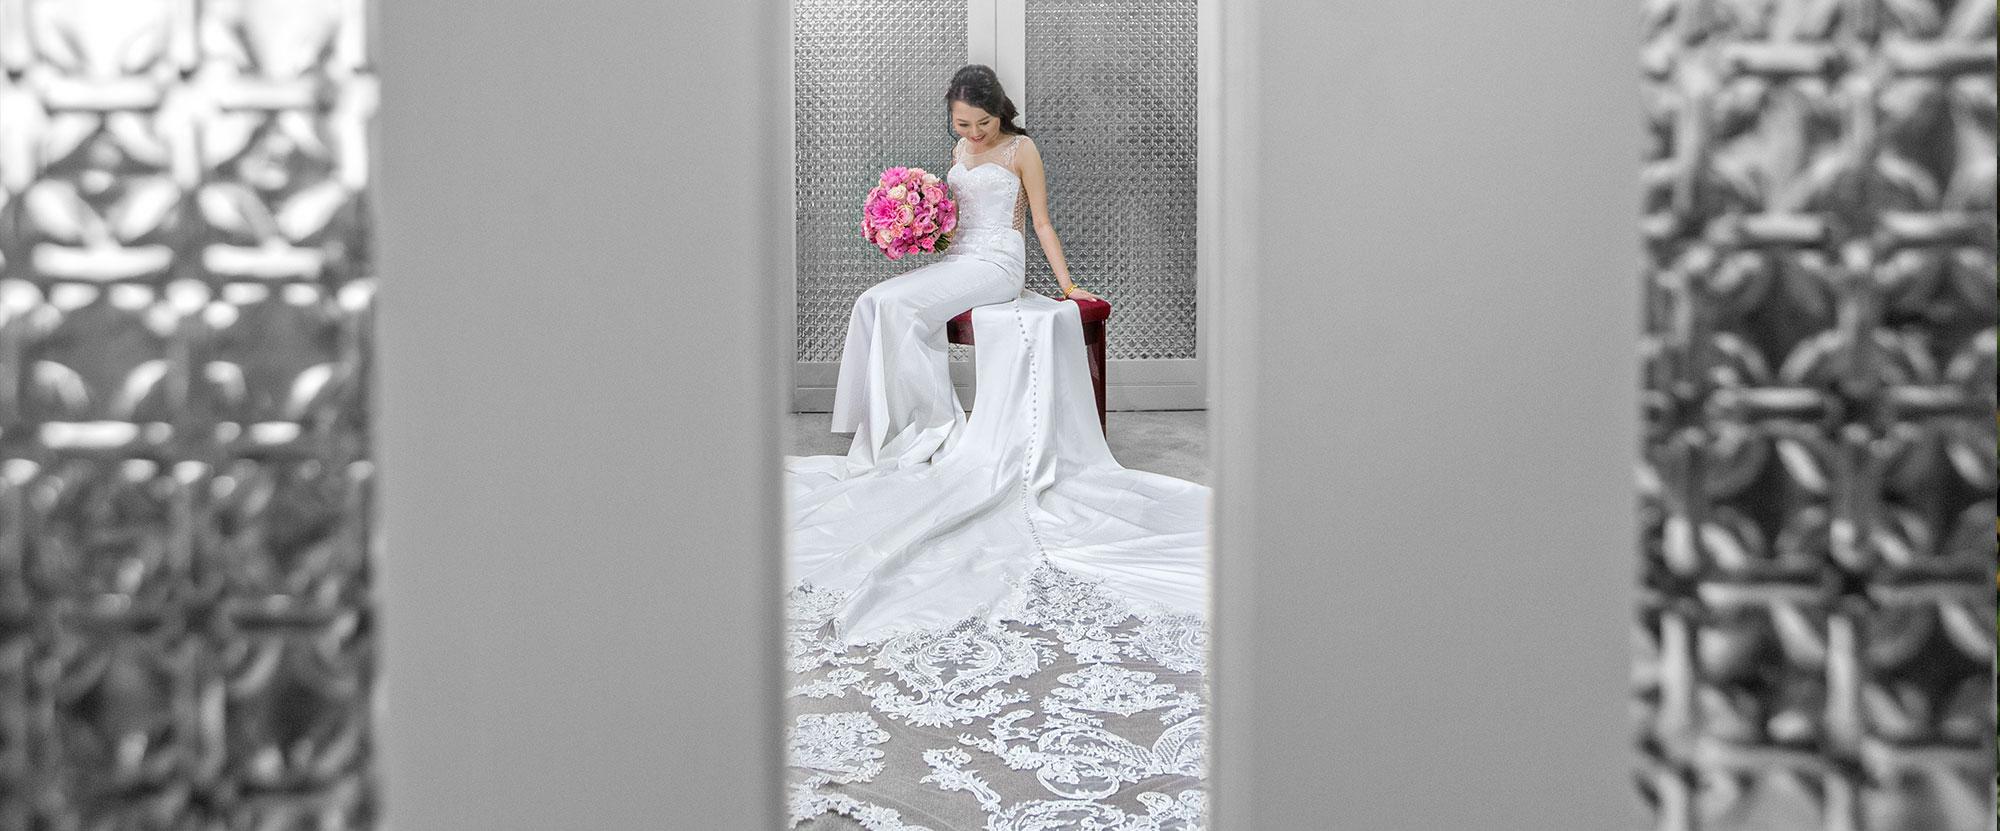 bride award winning photo aipp